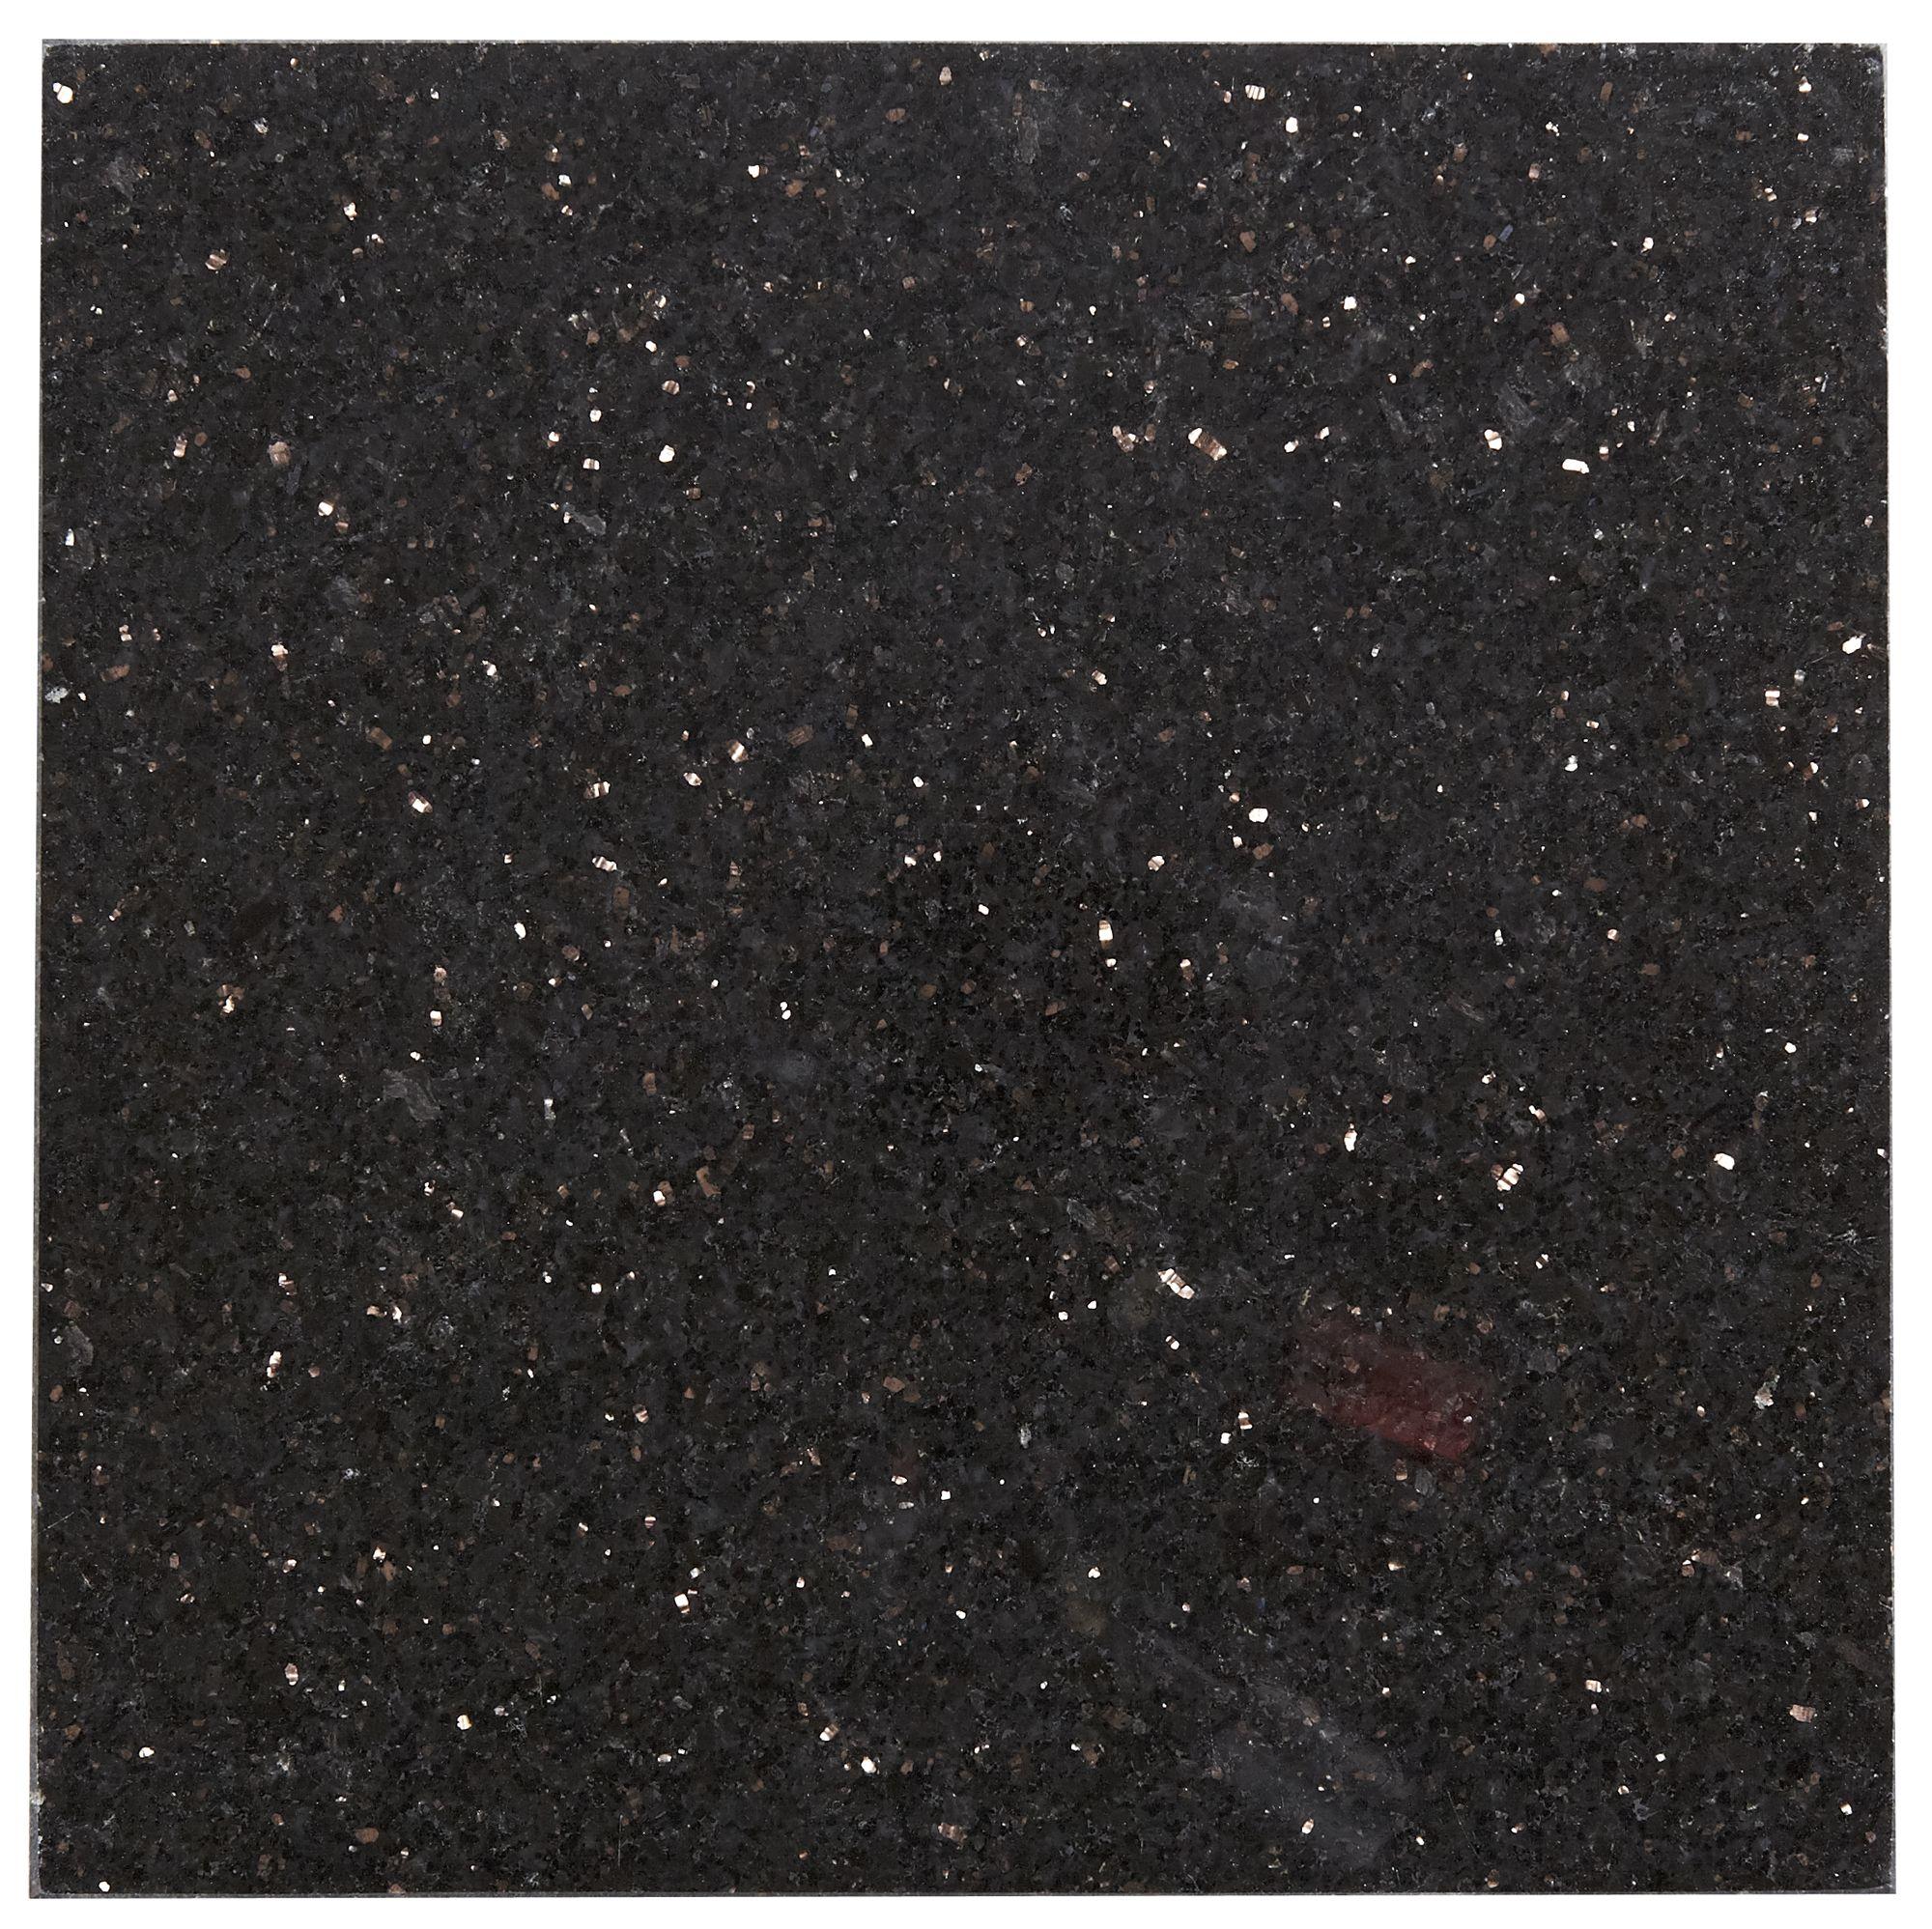 Galaxy Black Stone Effect Granite Wall Floor Tile Sample L 305mm W Departments Diy At B Q